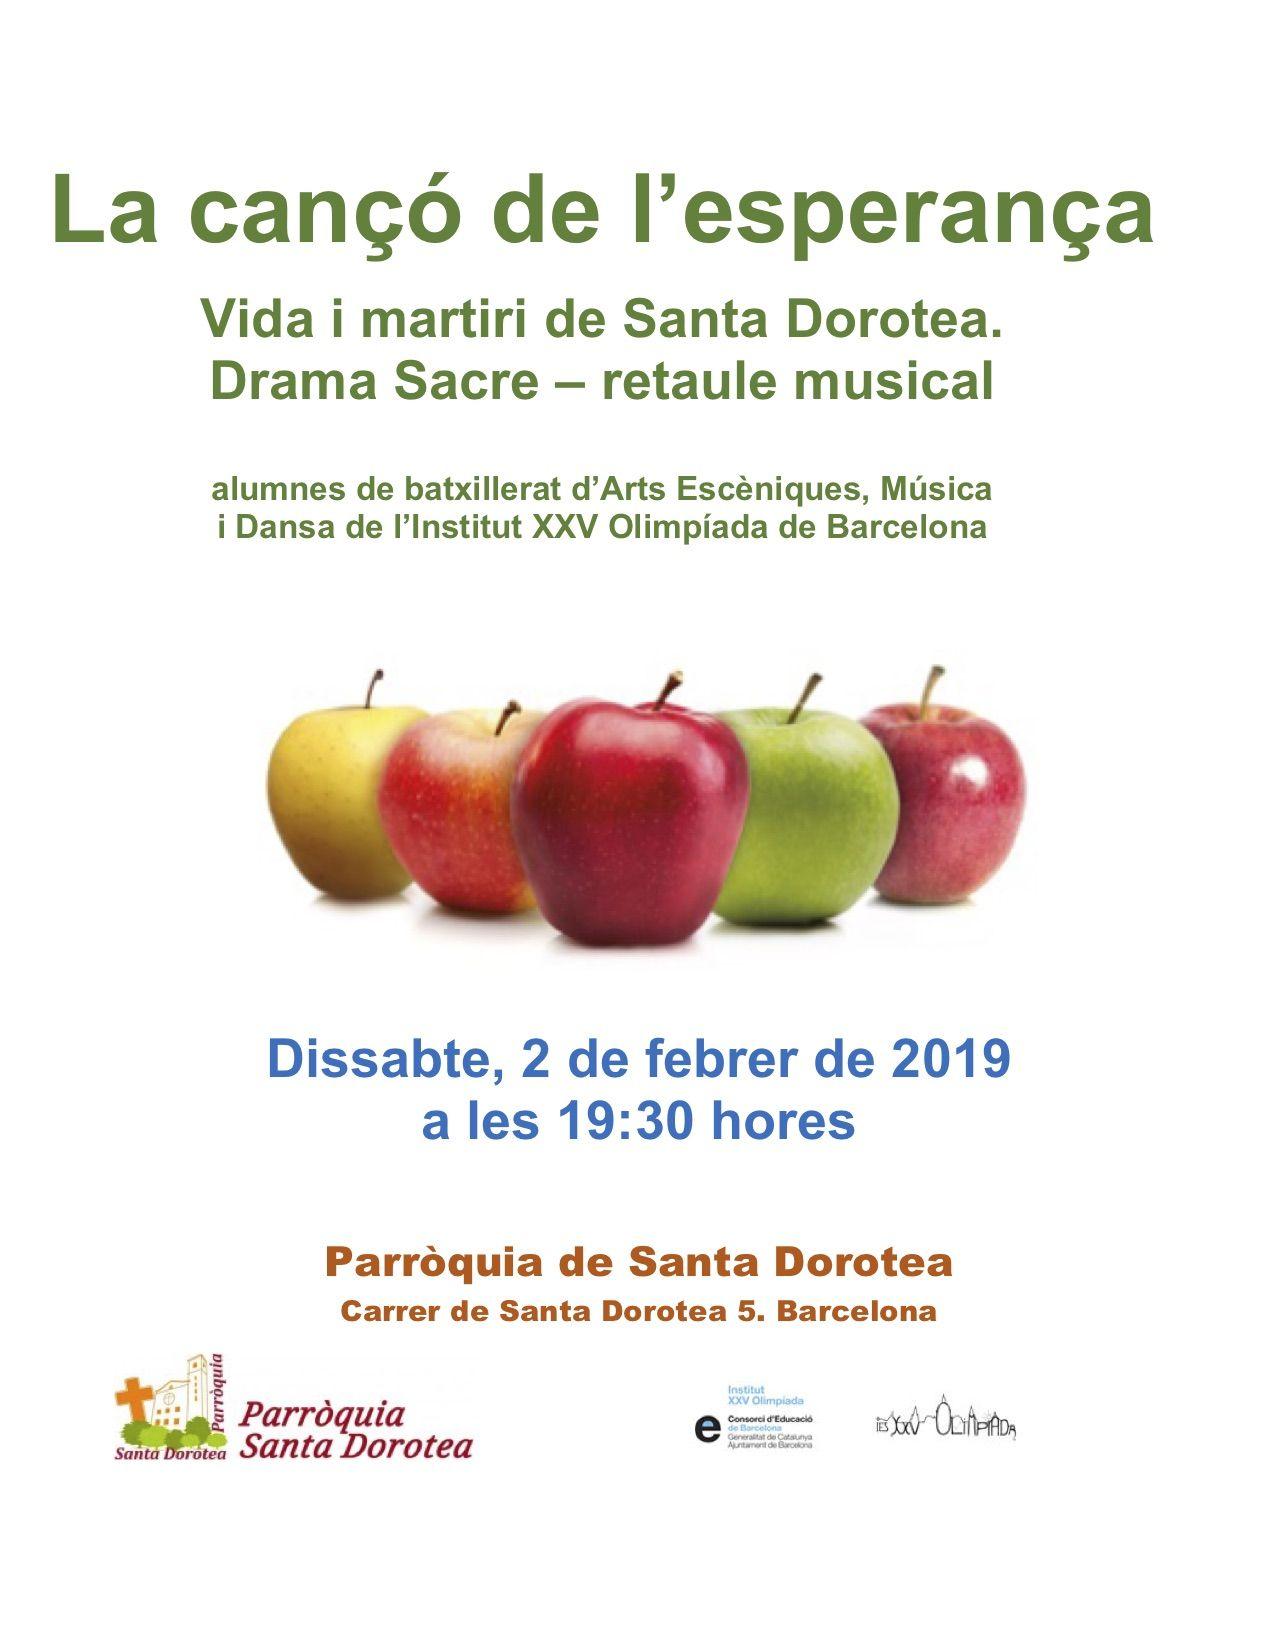 CARTELL MUSICAL STA DOROTEA 02_02_2019